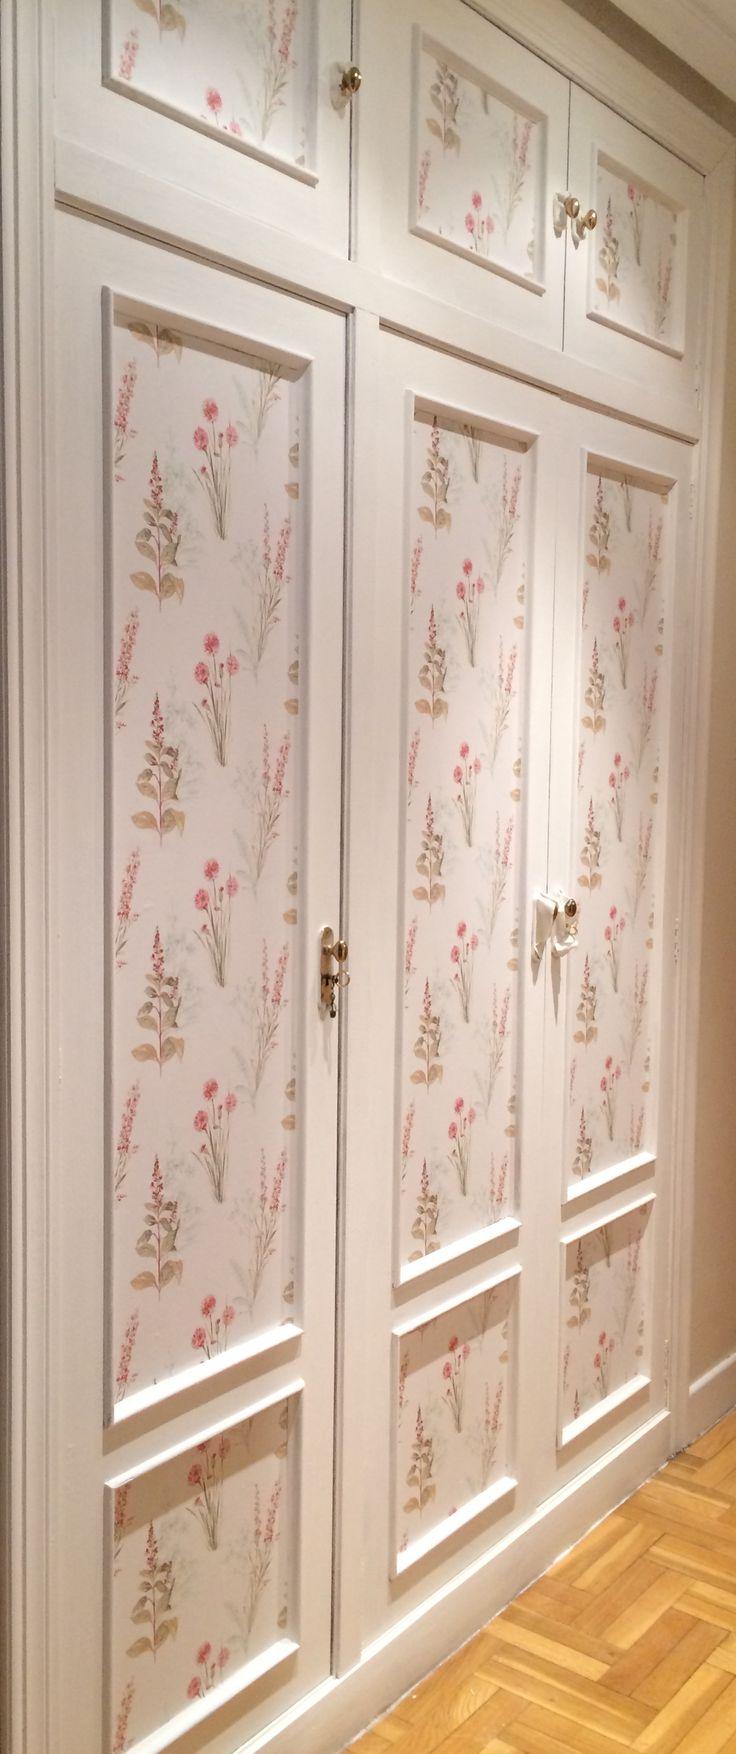 M s de 1000 ideas sobre armario pintado en pinterest - Ideas para decorar un armario por fuera ...